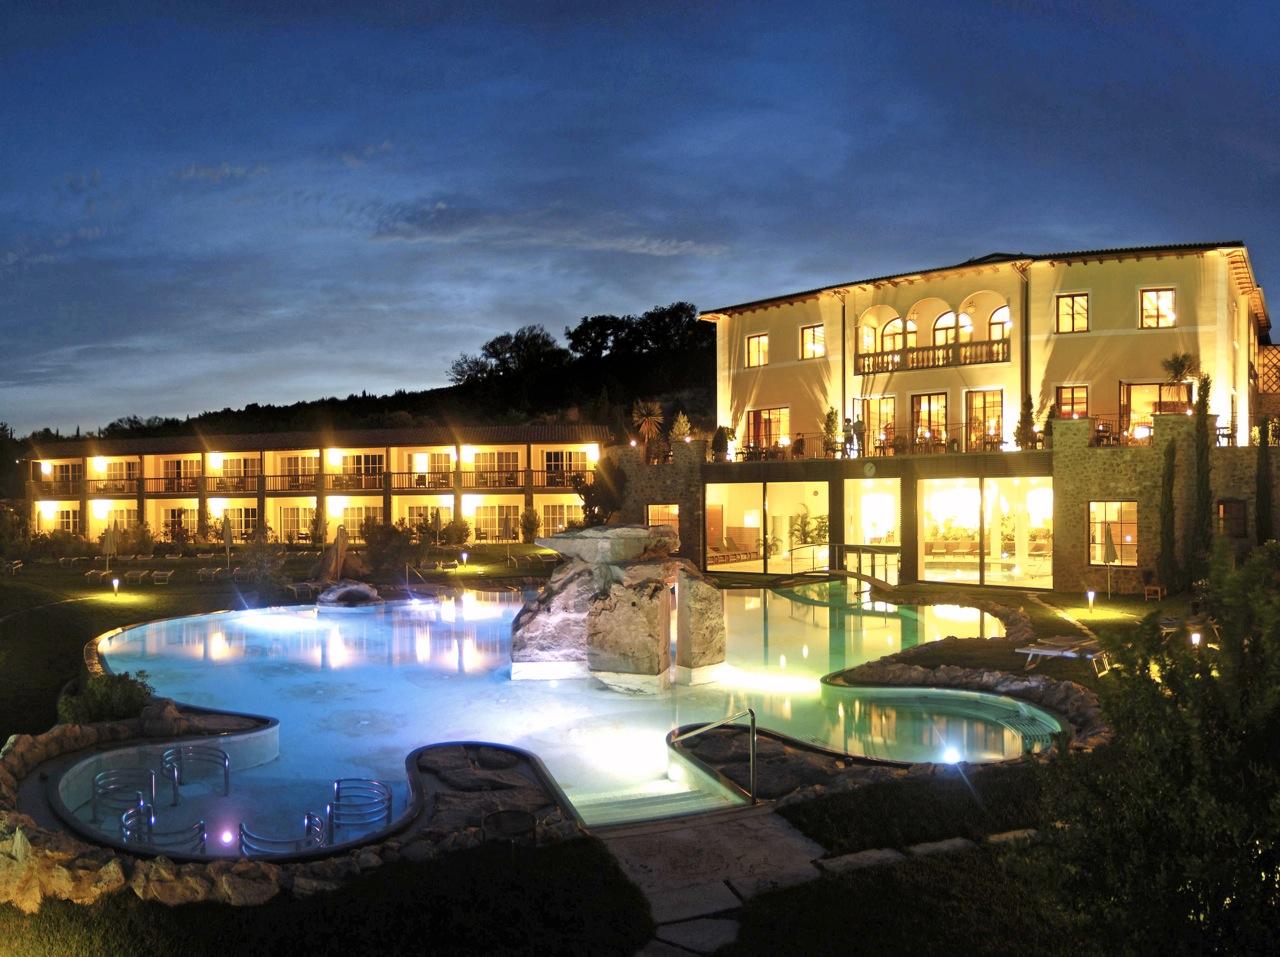 ADLER THERMAE Spa Resort Bilder | Bild 1